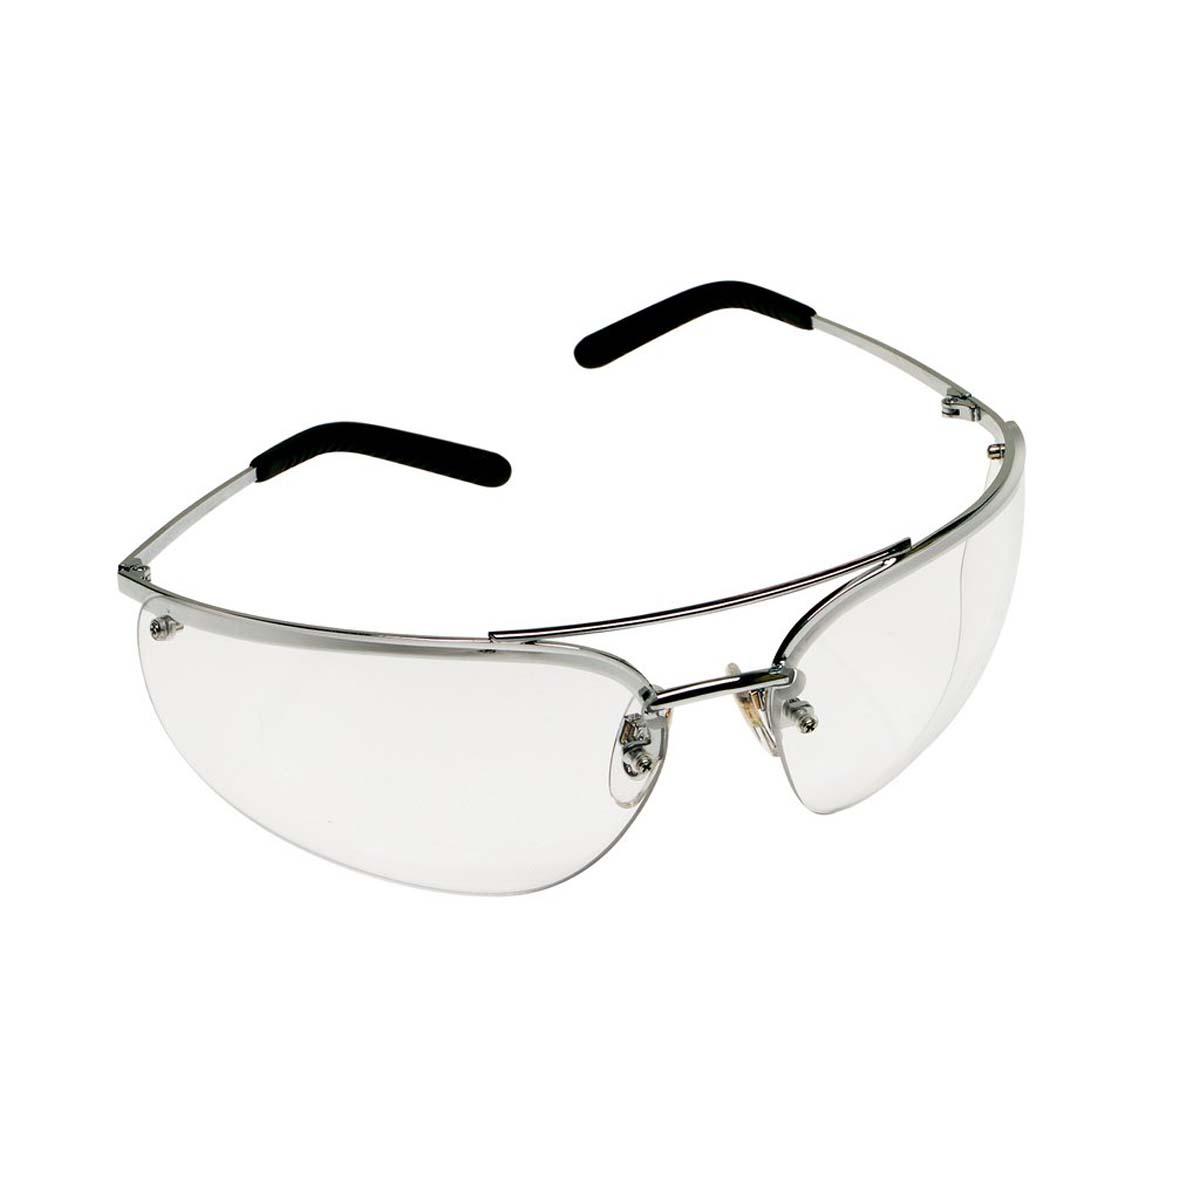 "3Mâ""¢ Metaliksâ""¢ Protective Eyewear 15170-10000-20 Clear Anti-Fog Lens, Polished Metal Frame"